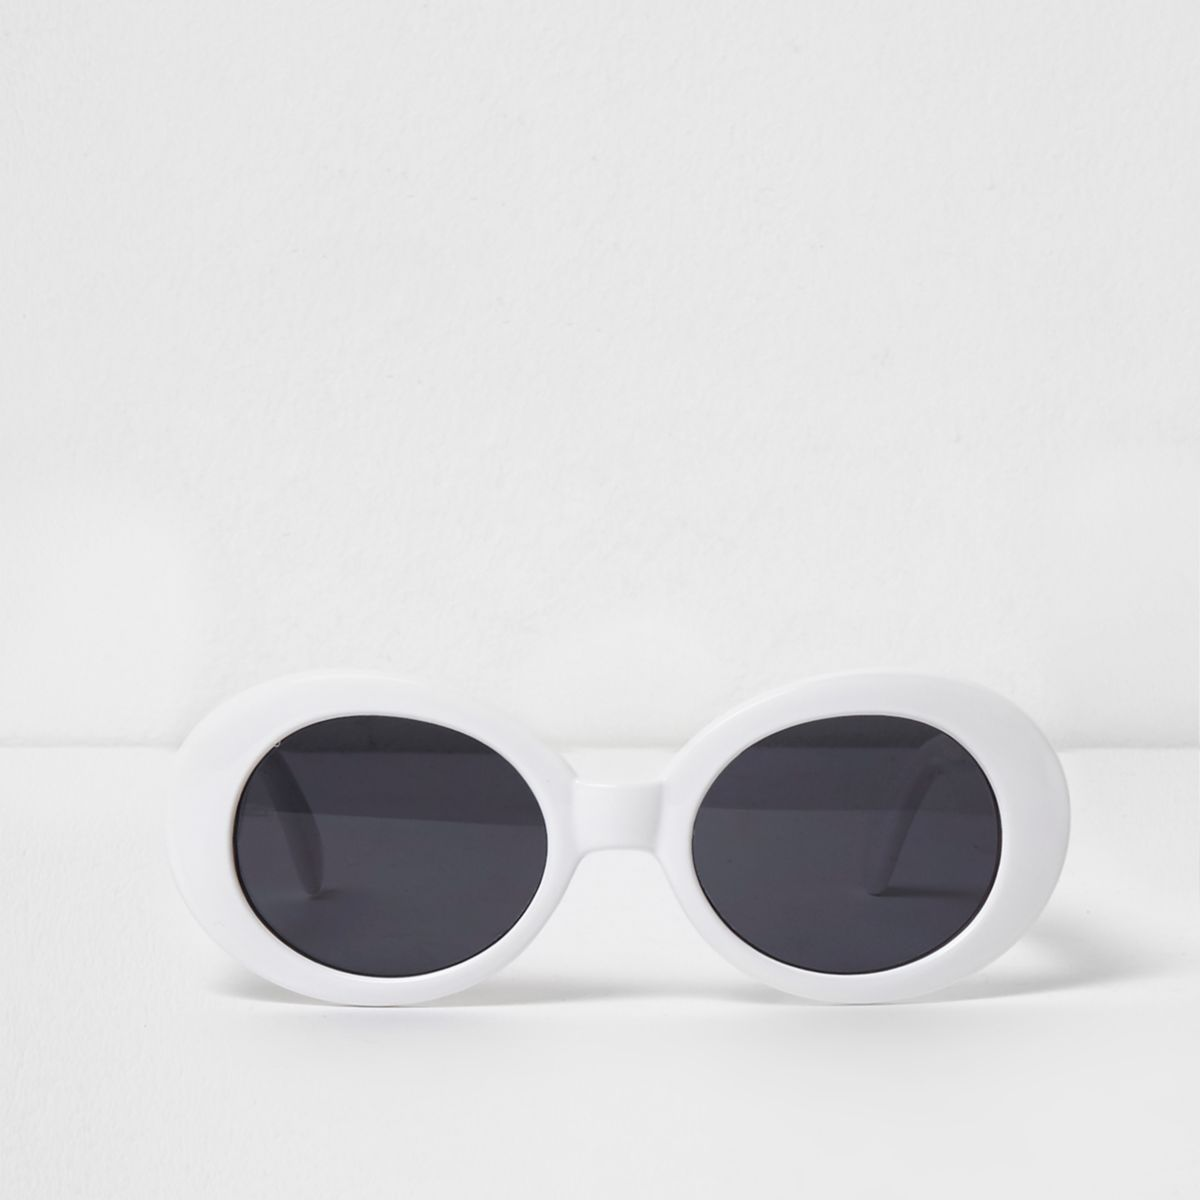 White oval smoke lens sunglasses